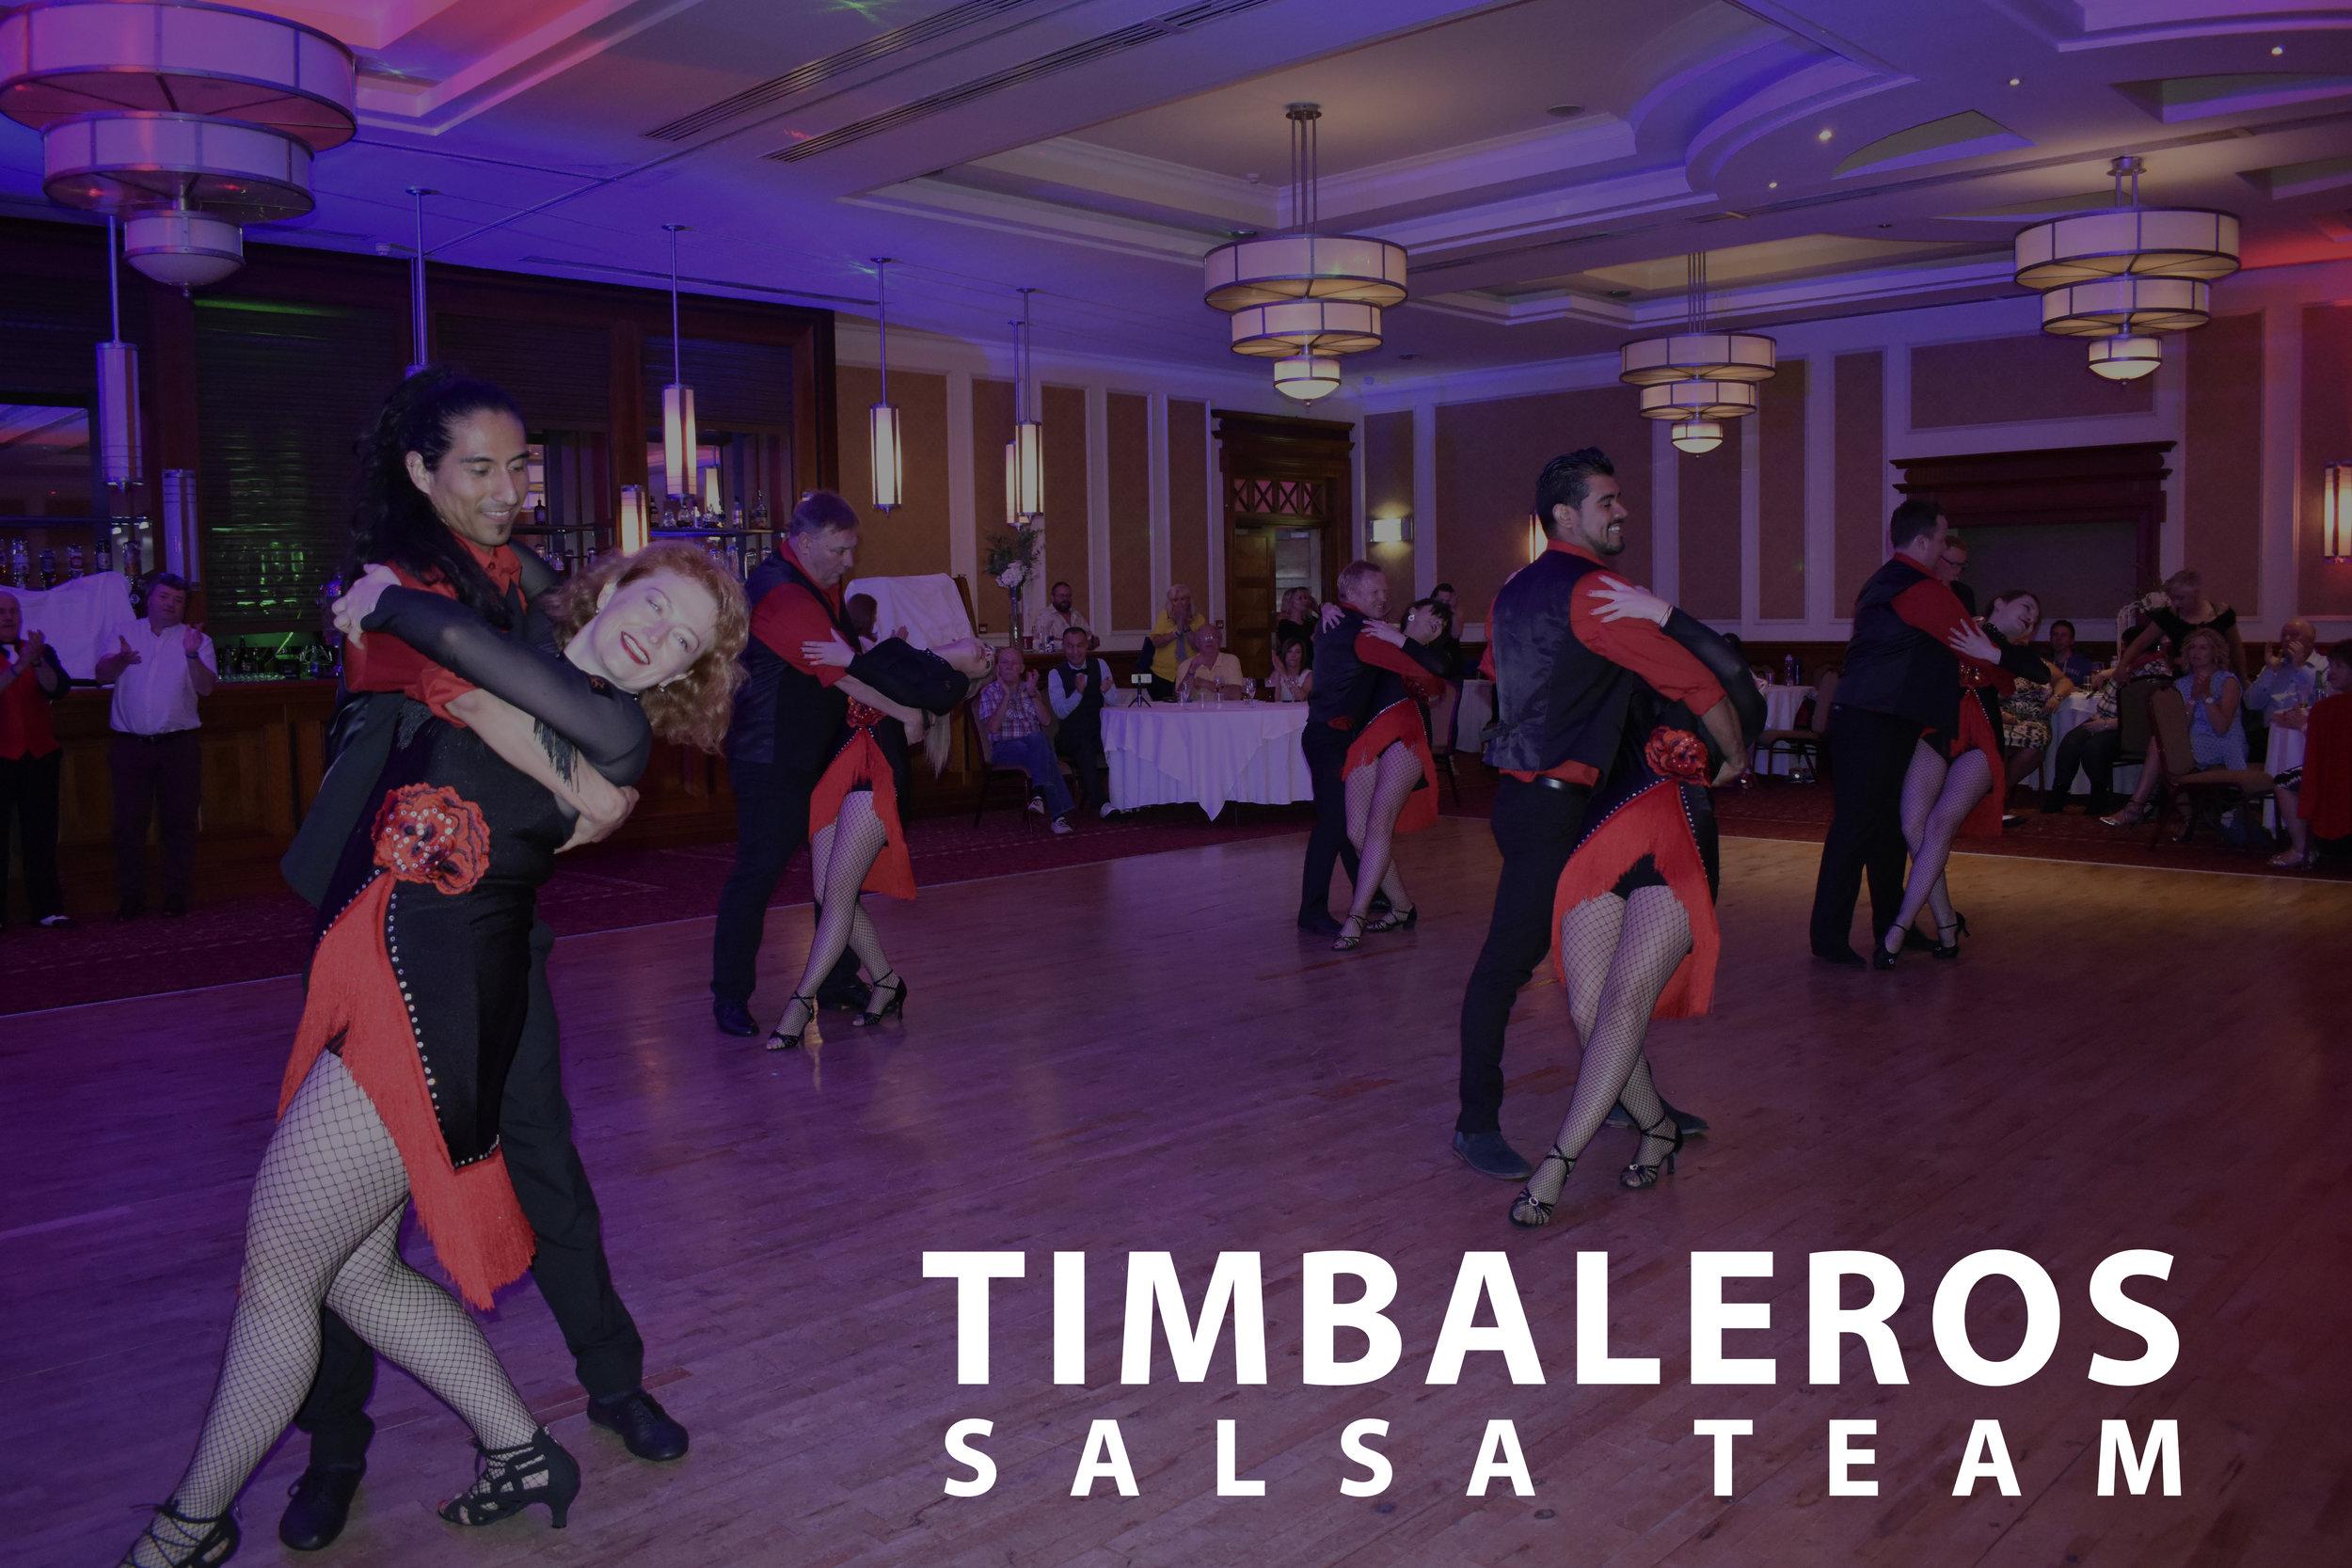 TIMBALEROS SALSA TEAM.jpg